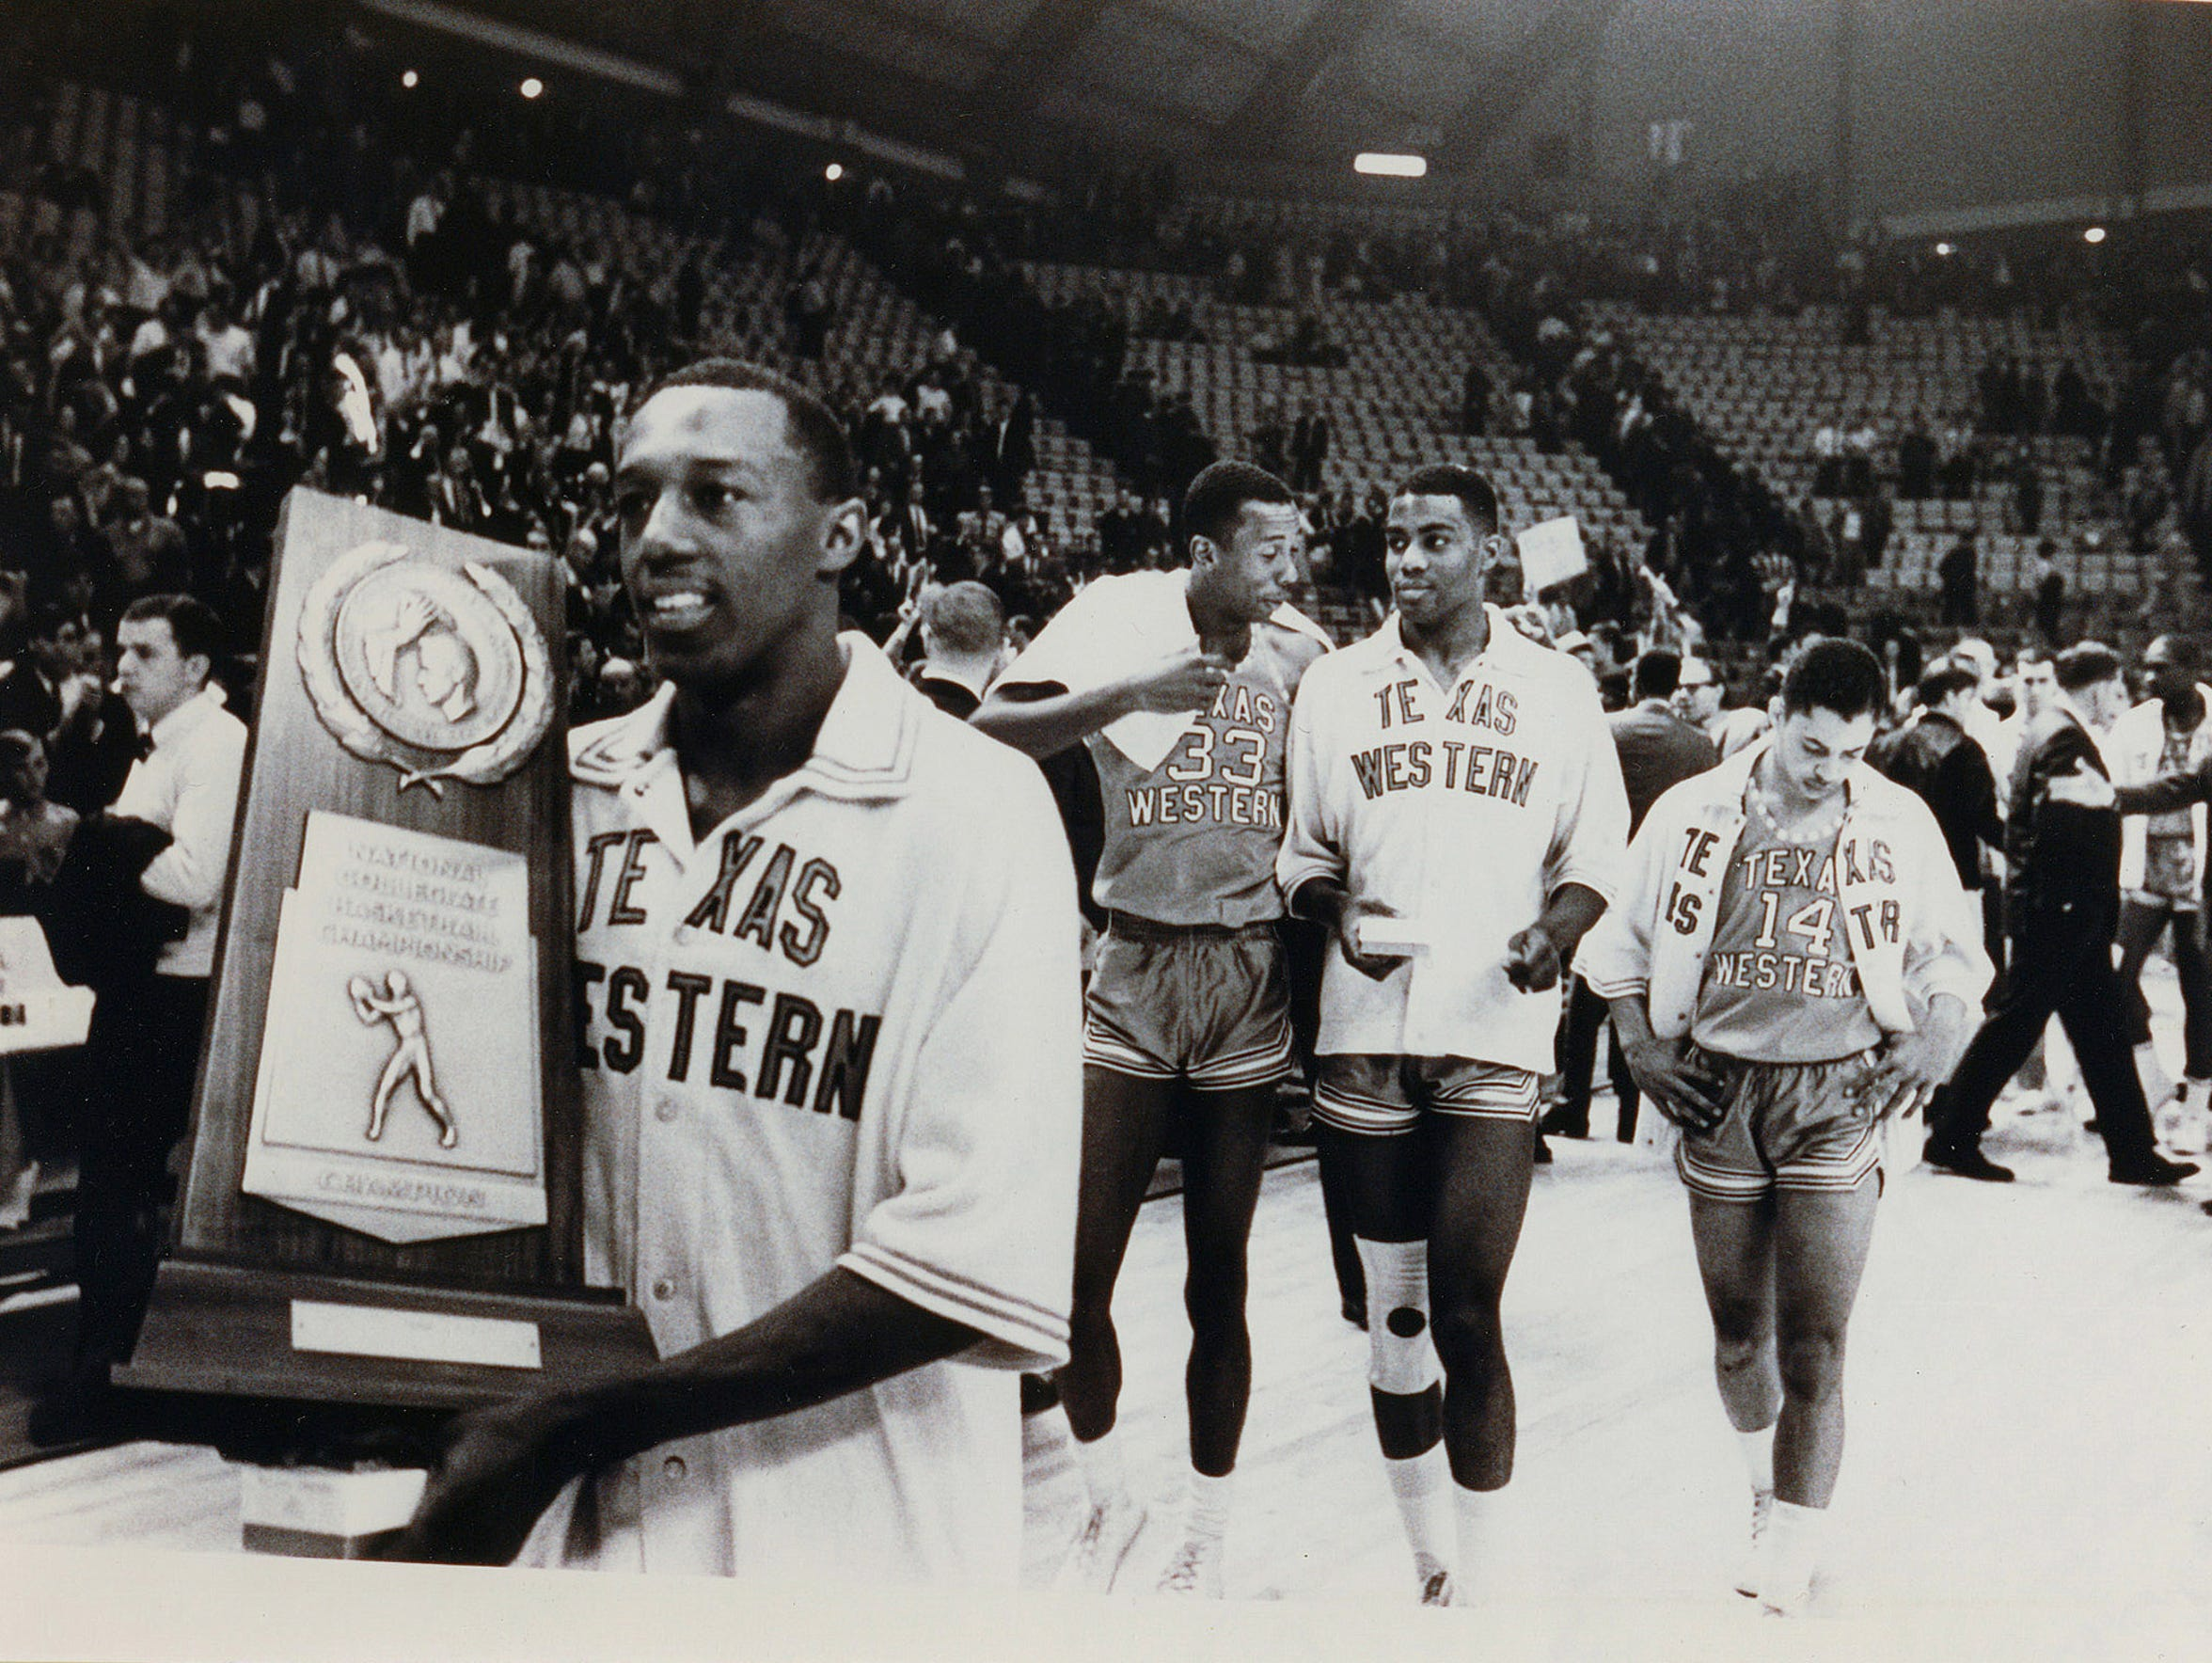 Members of the 1966 NCAA Championship team walk off